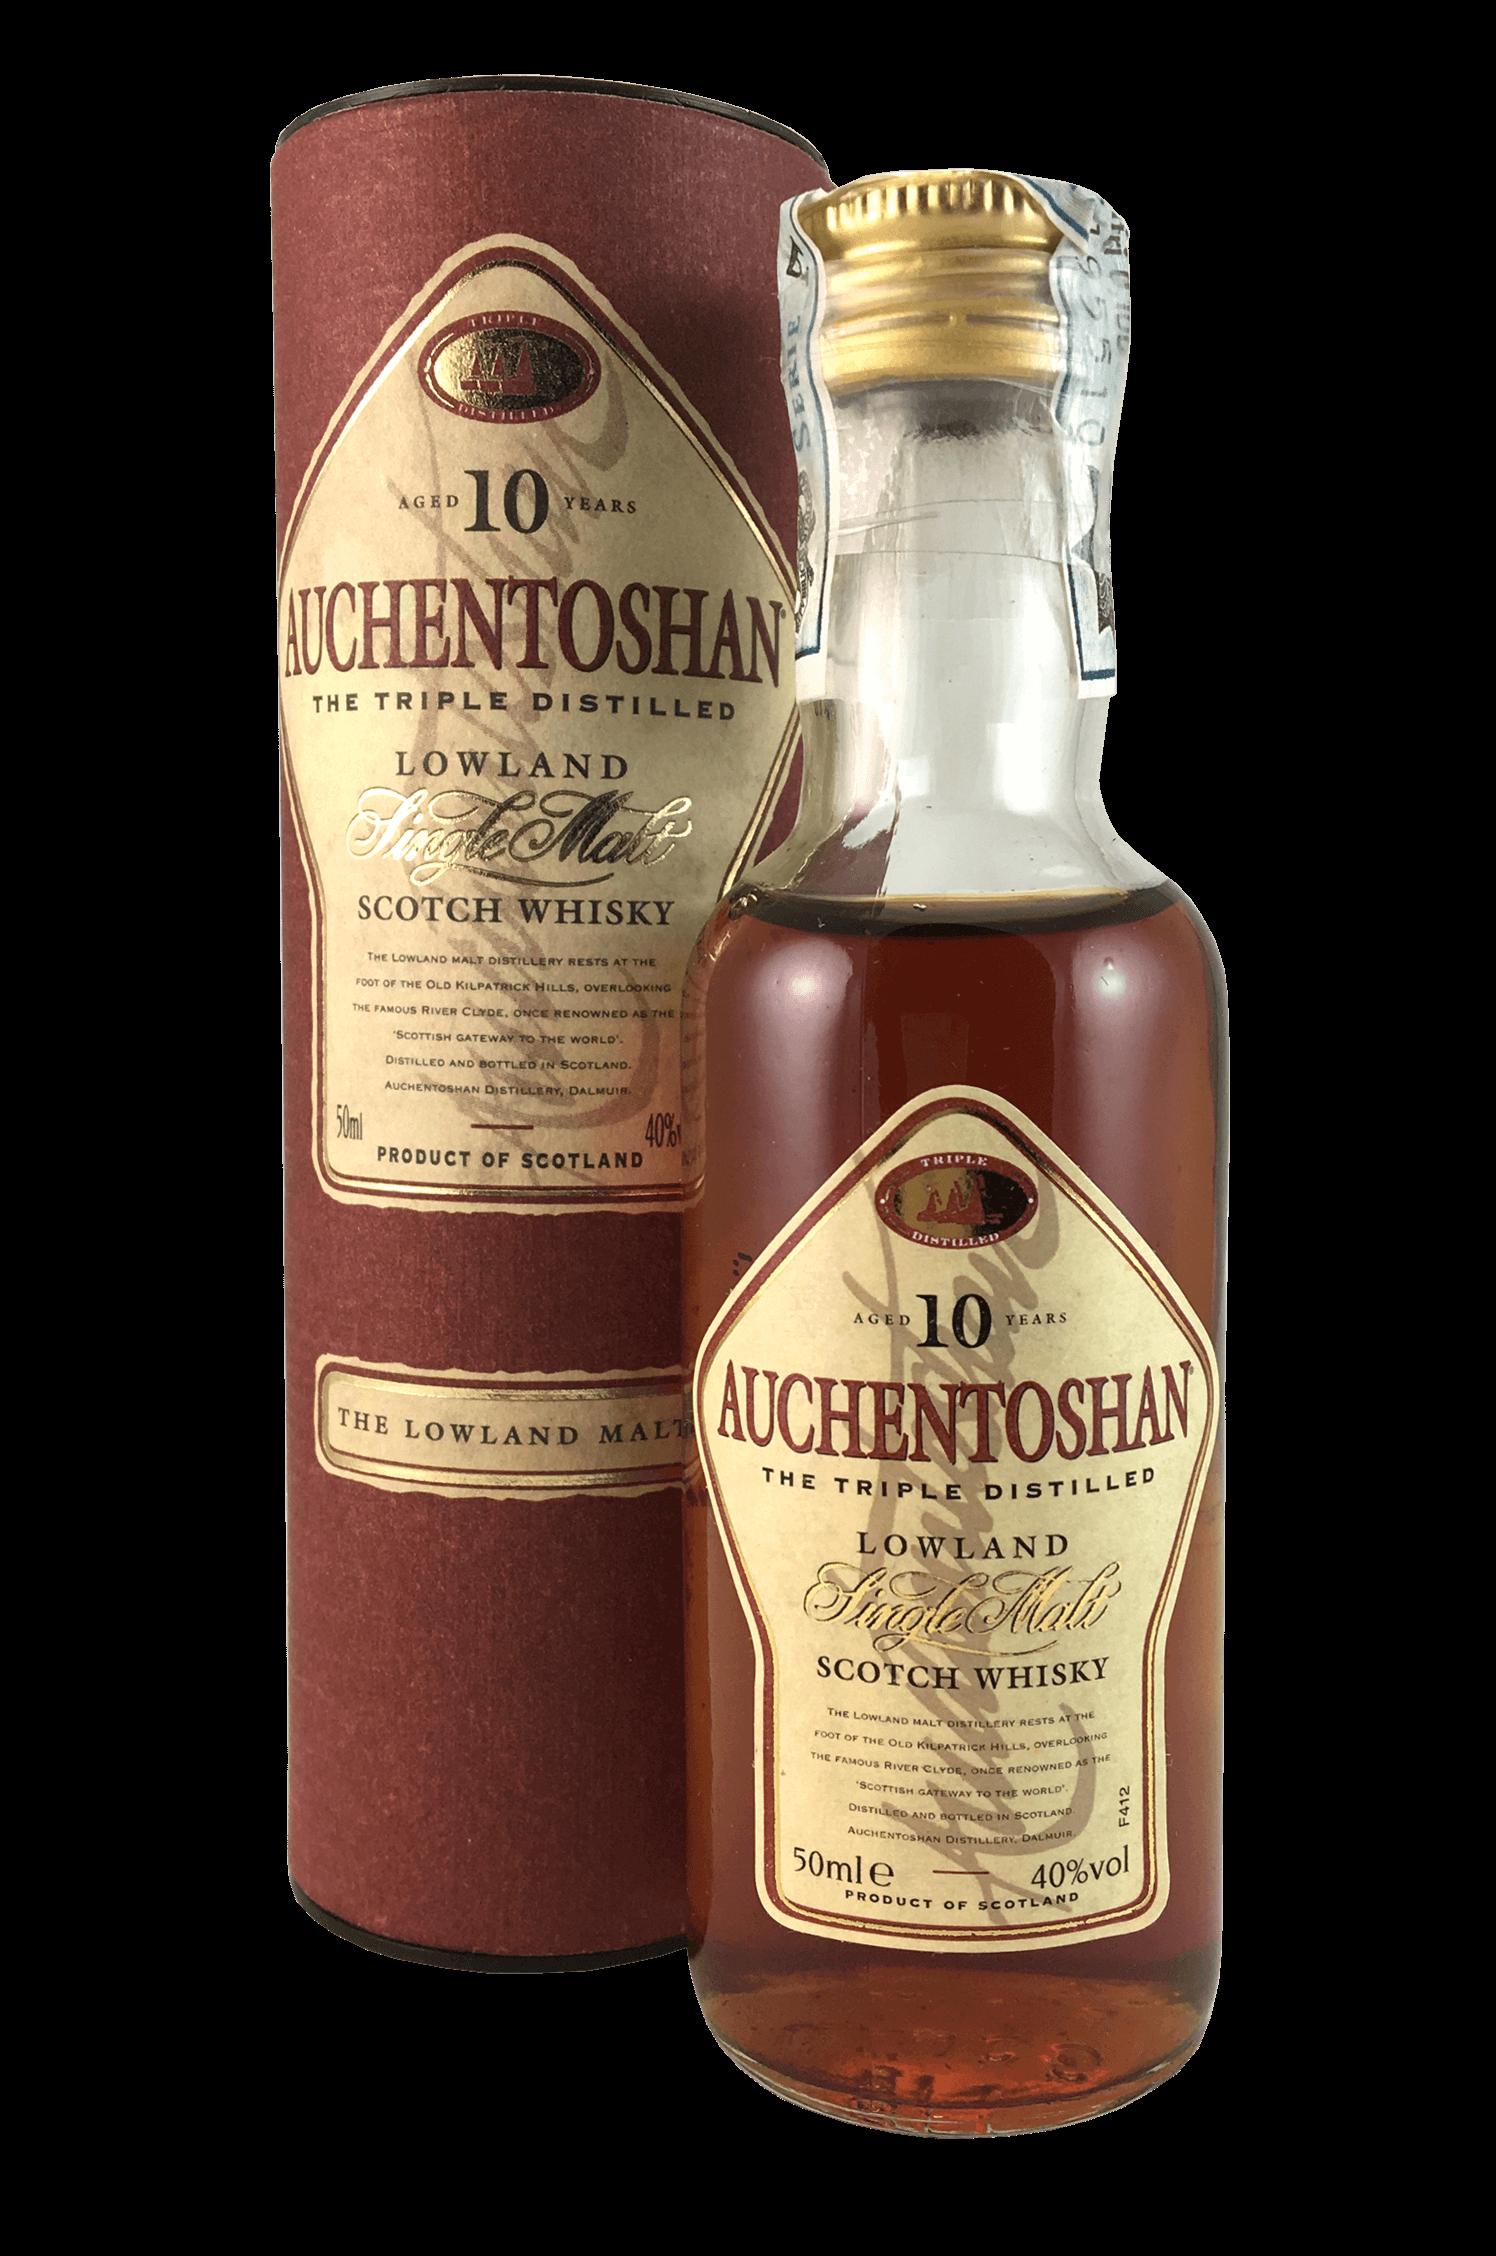 Auchentoshan Lowland Scotch Whisky